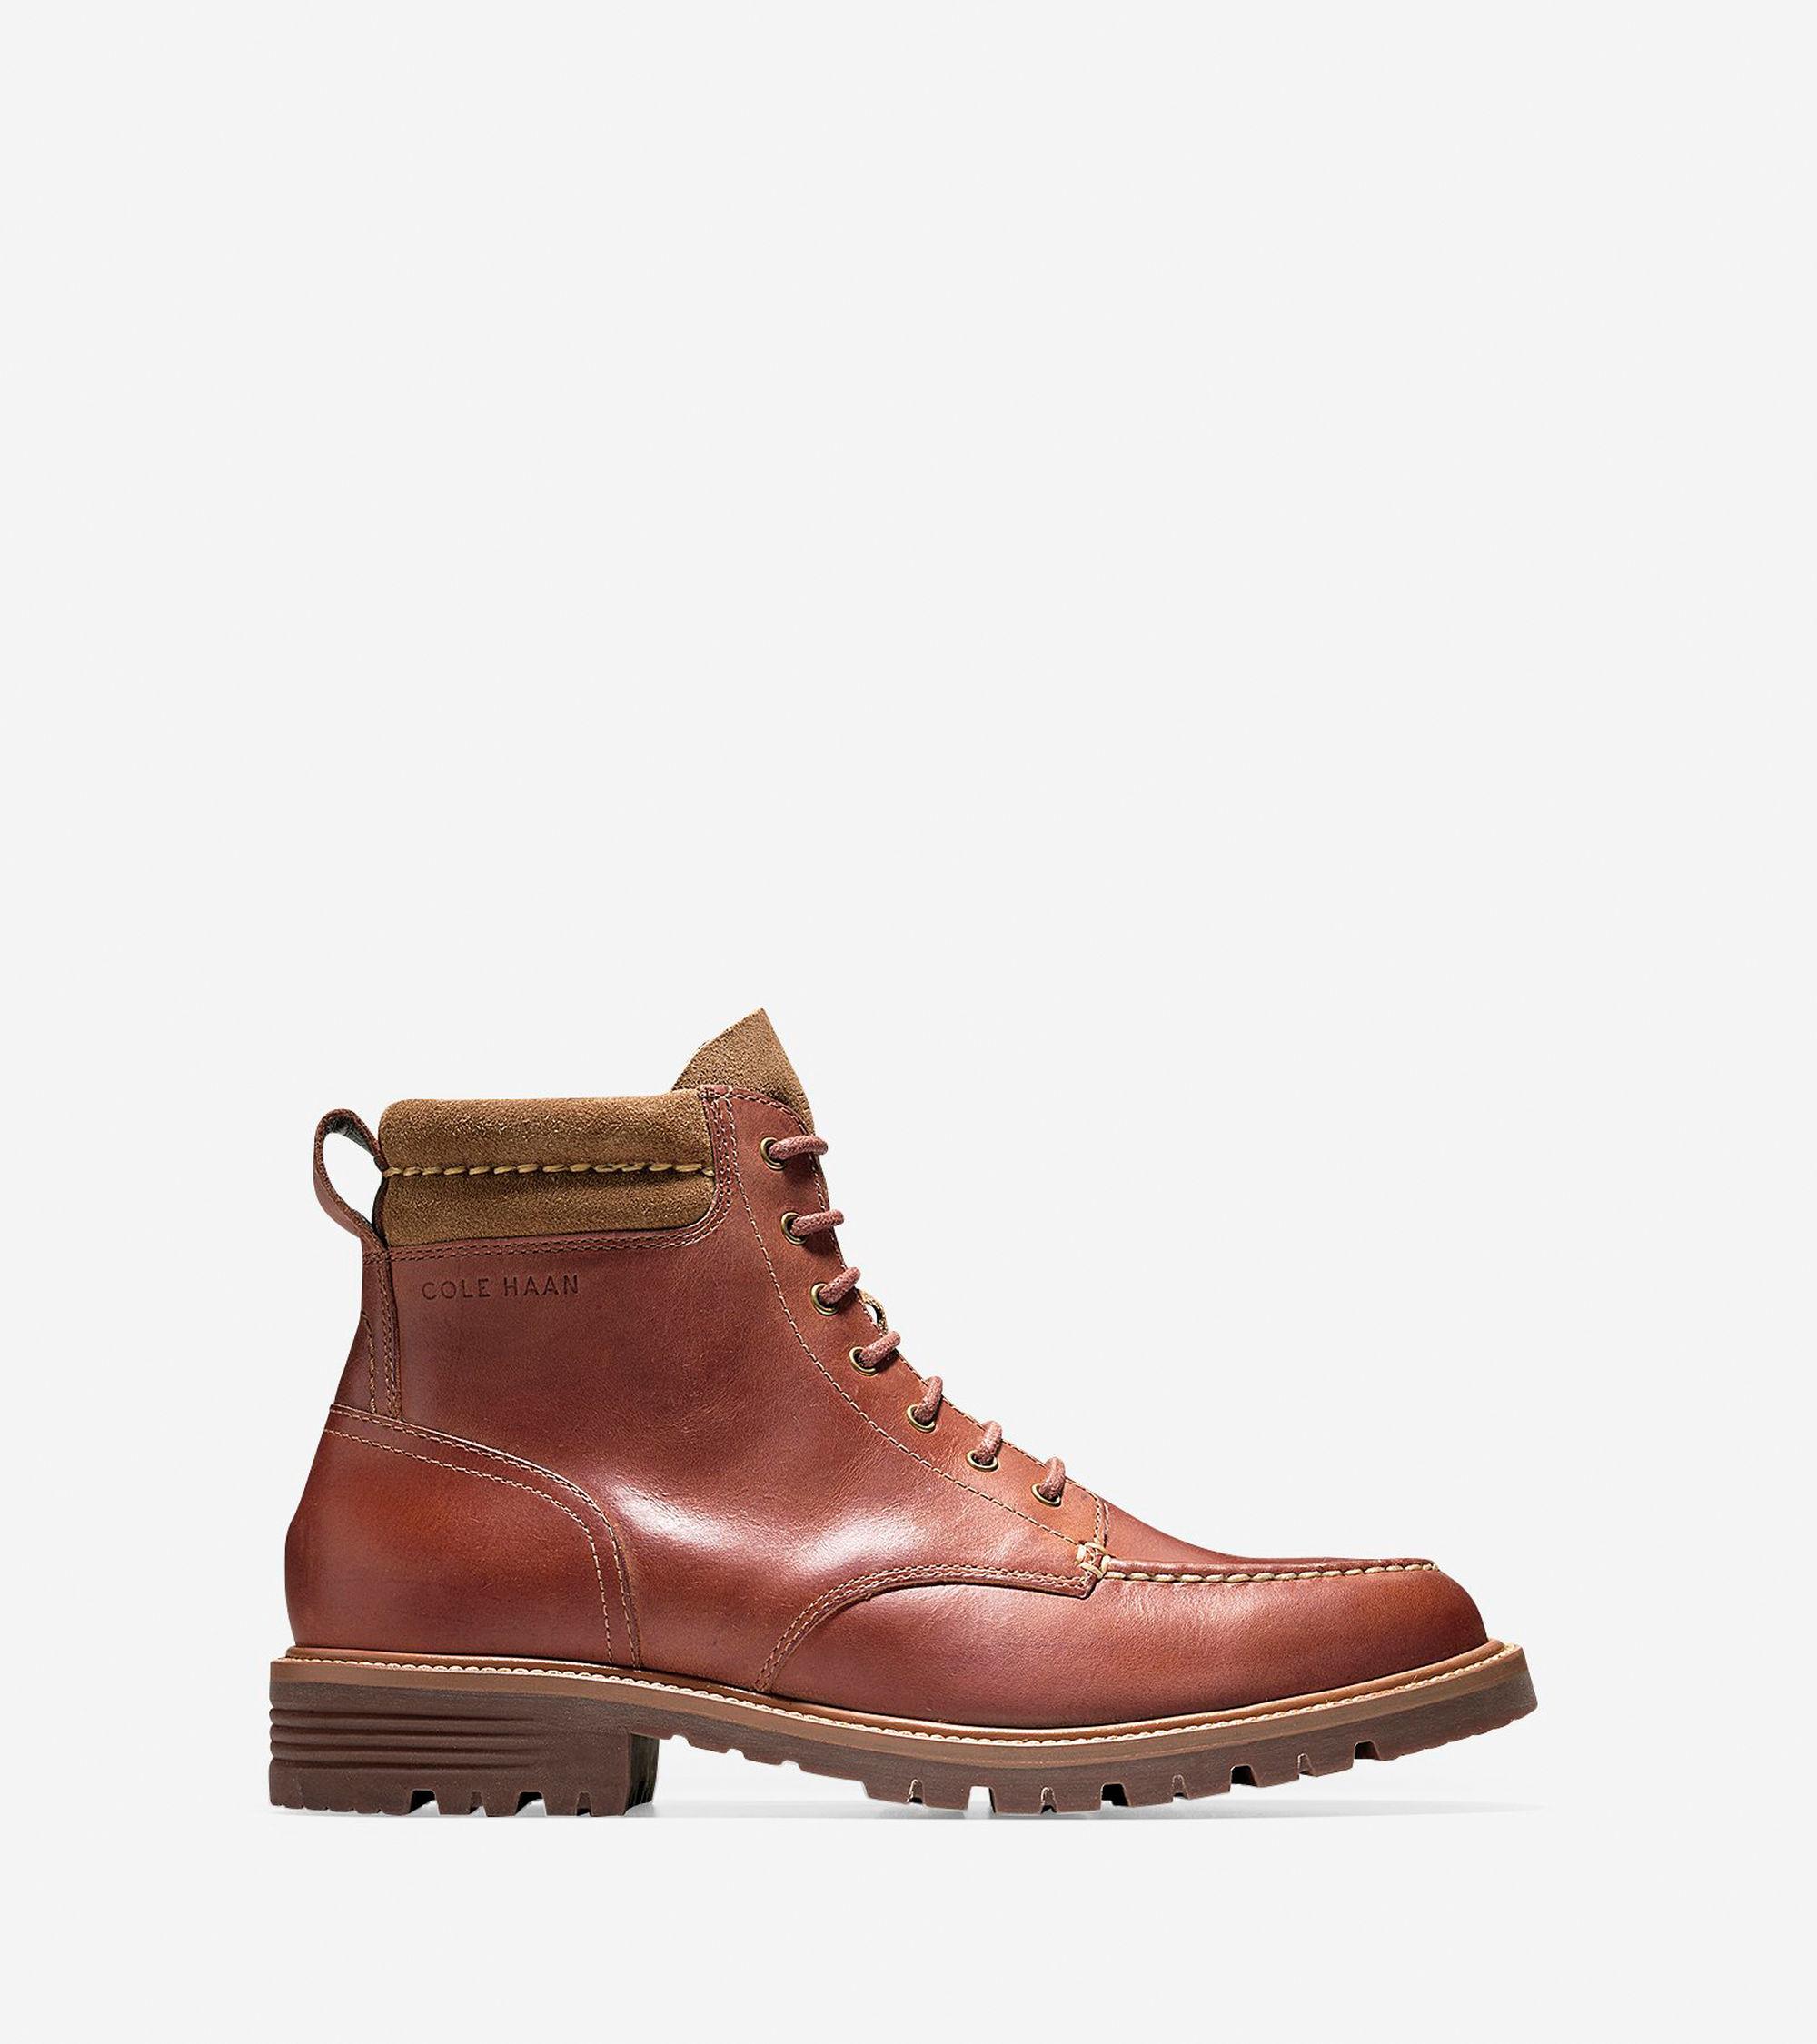 Waterproof Mens Leather Dress Shoes Clark